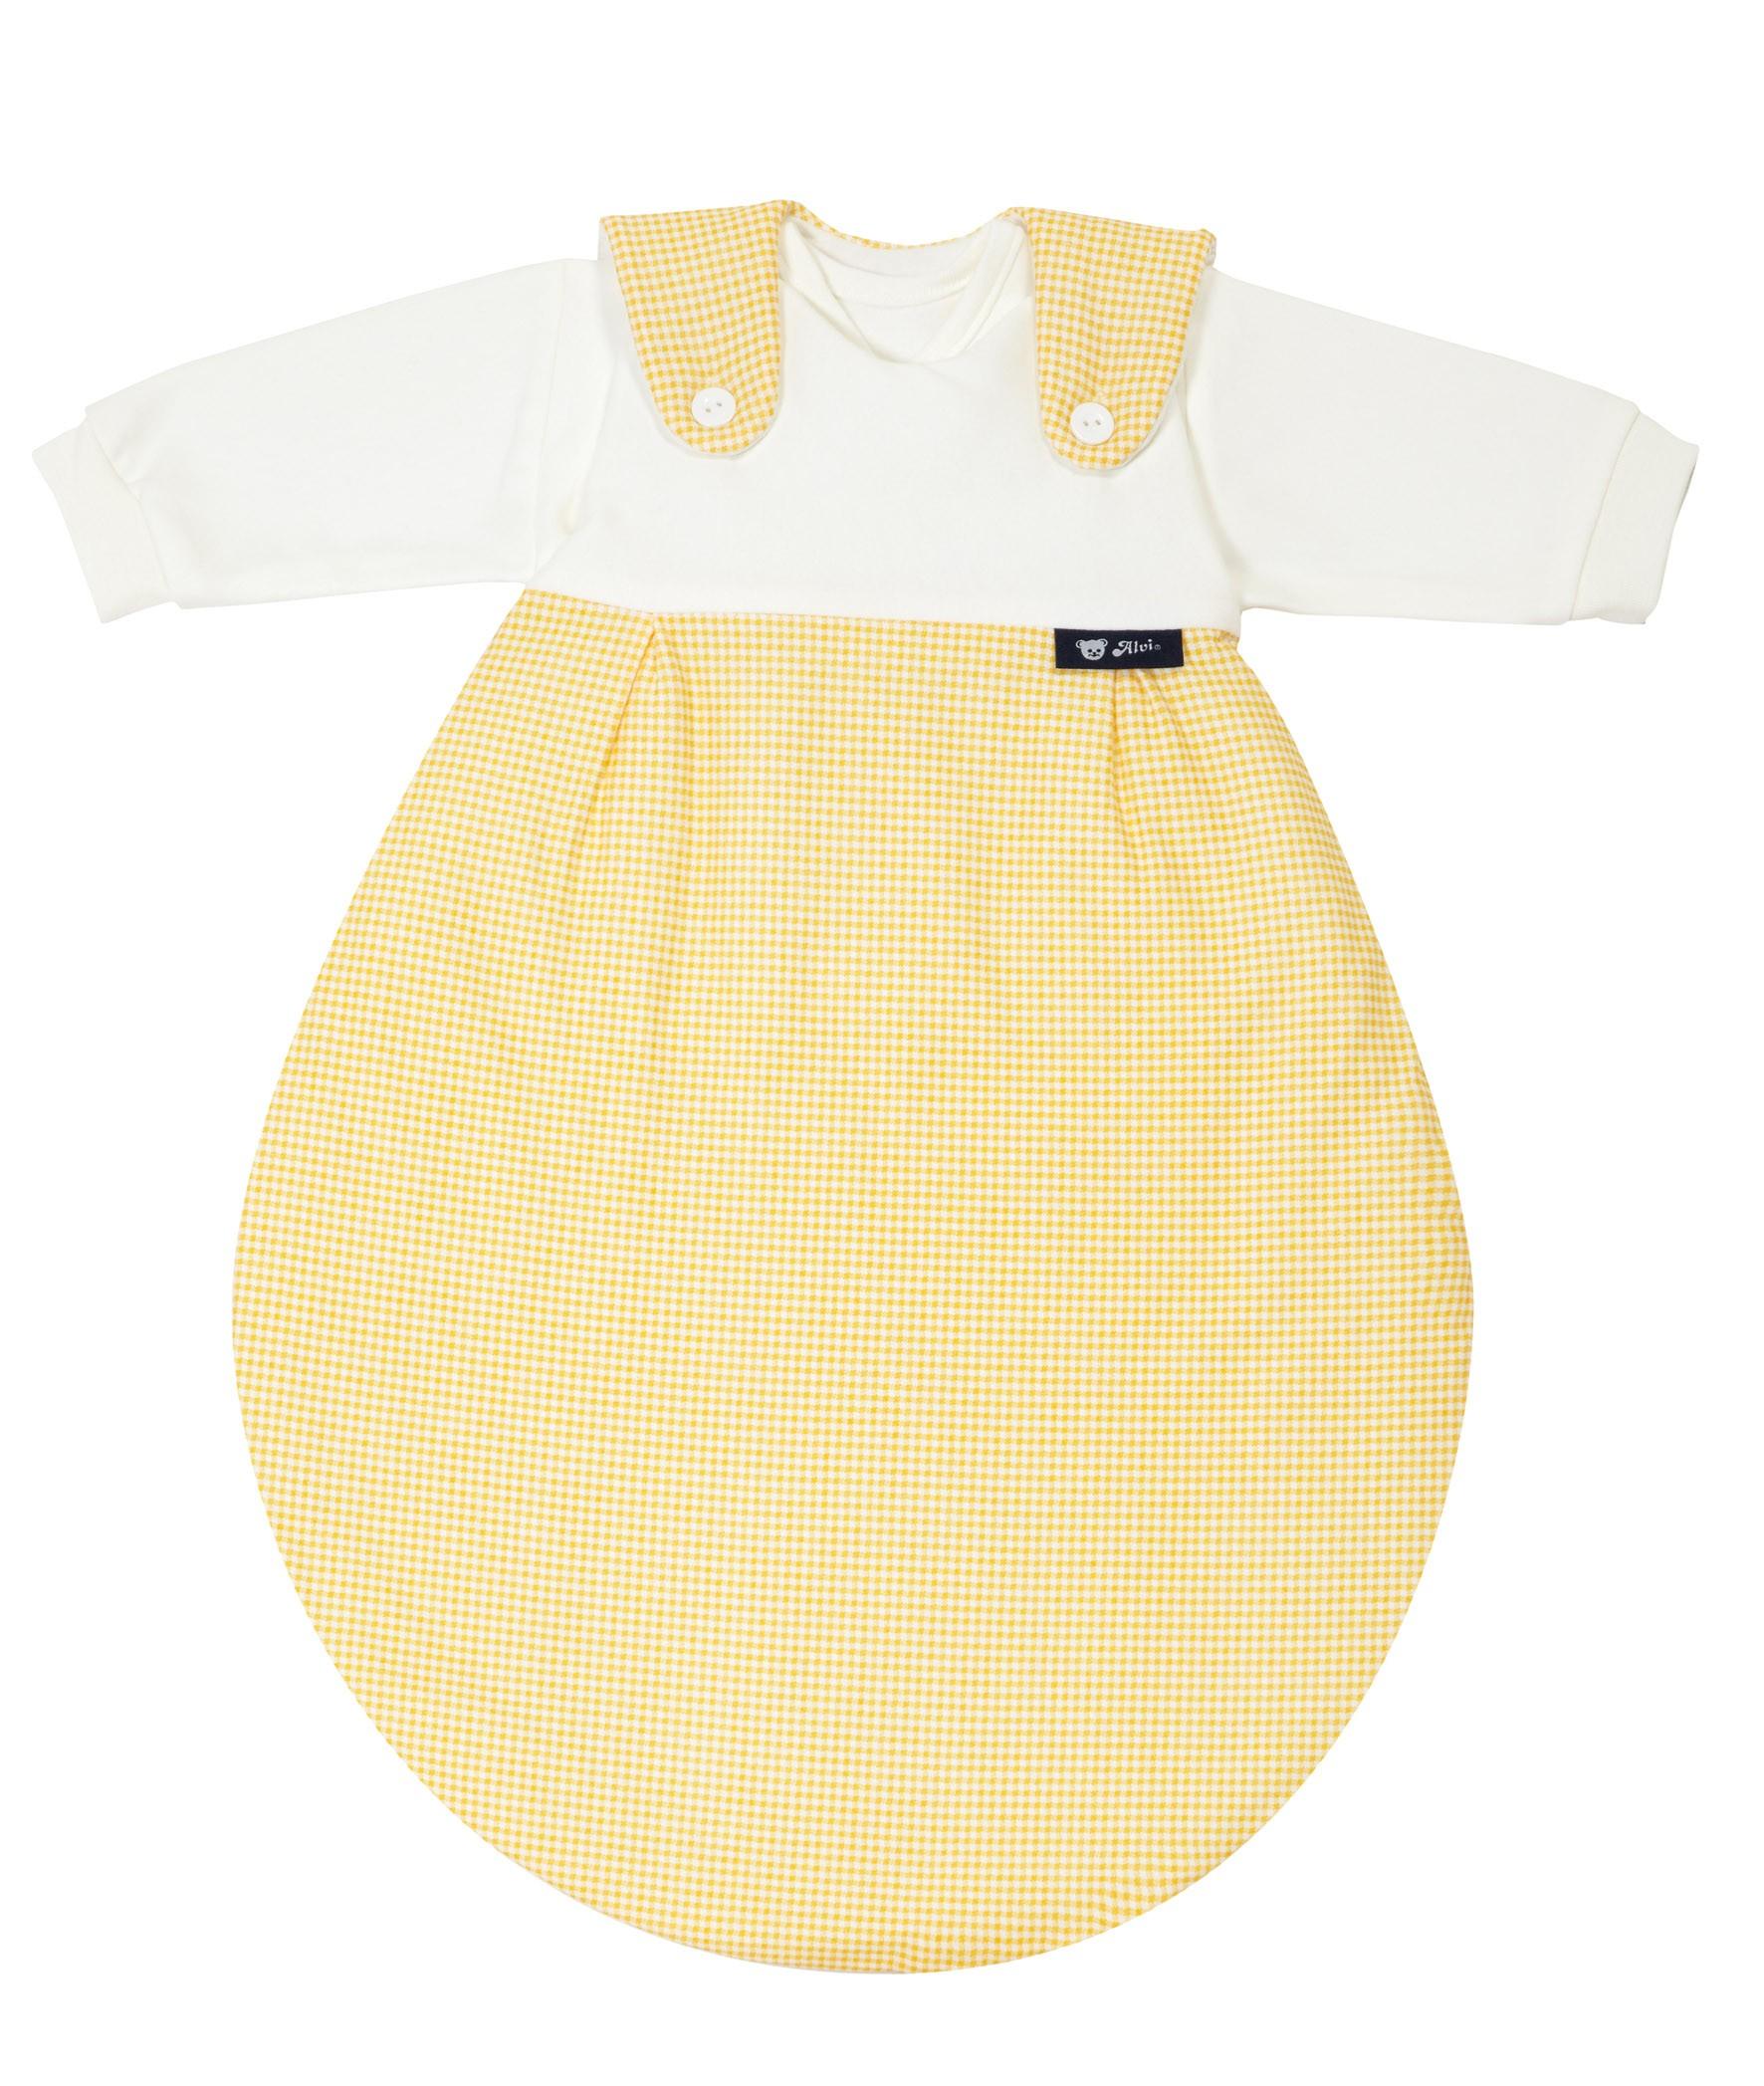 Alvi Baby Mäxchen 372-4 Karo gelb